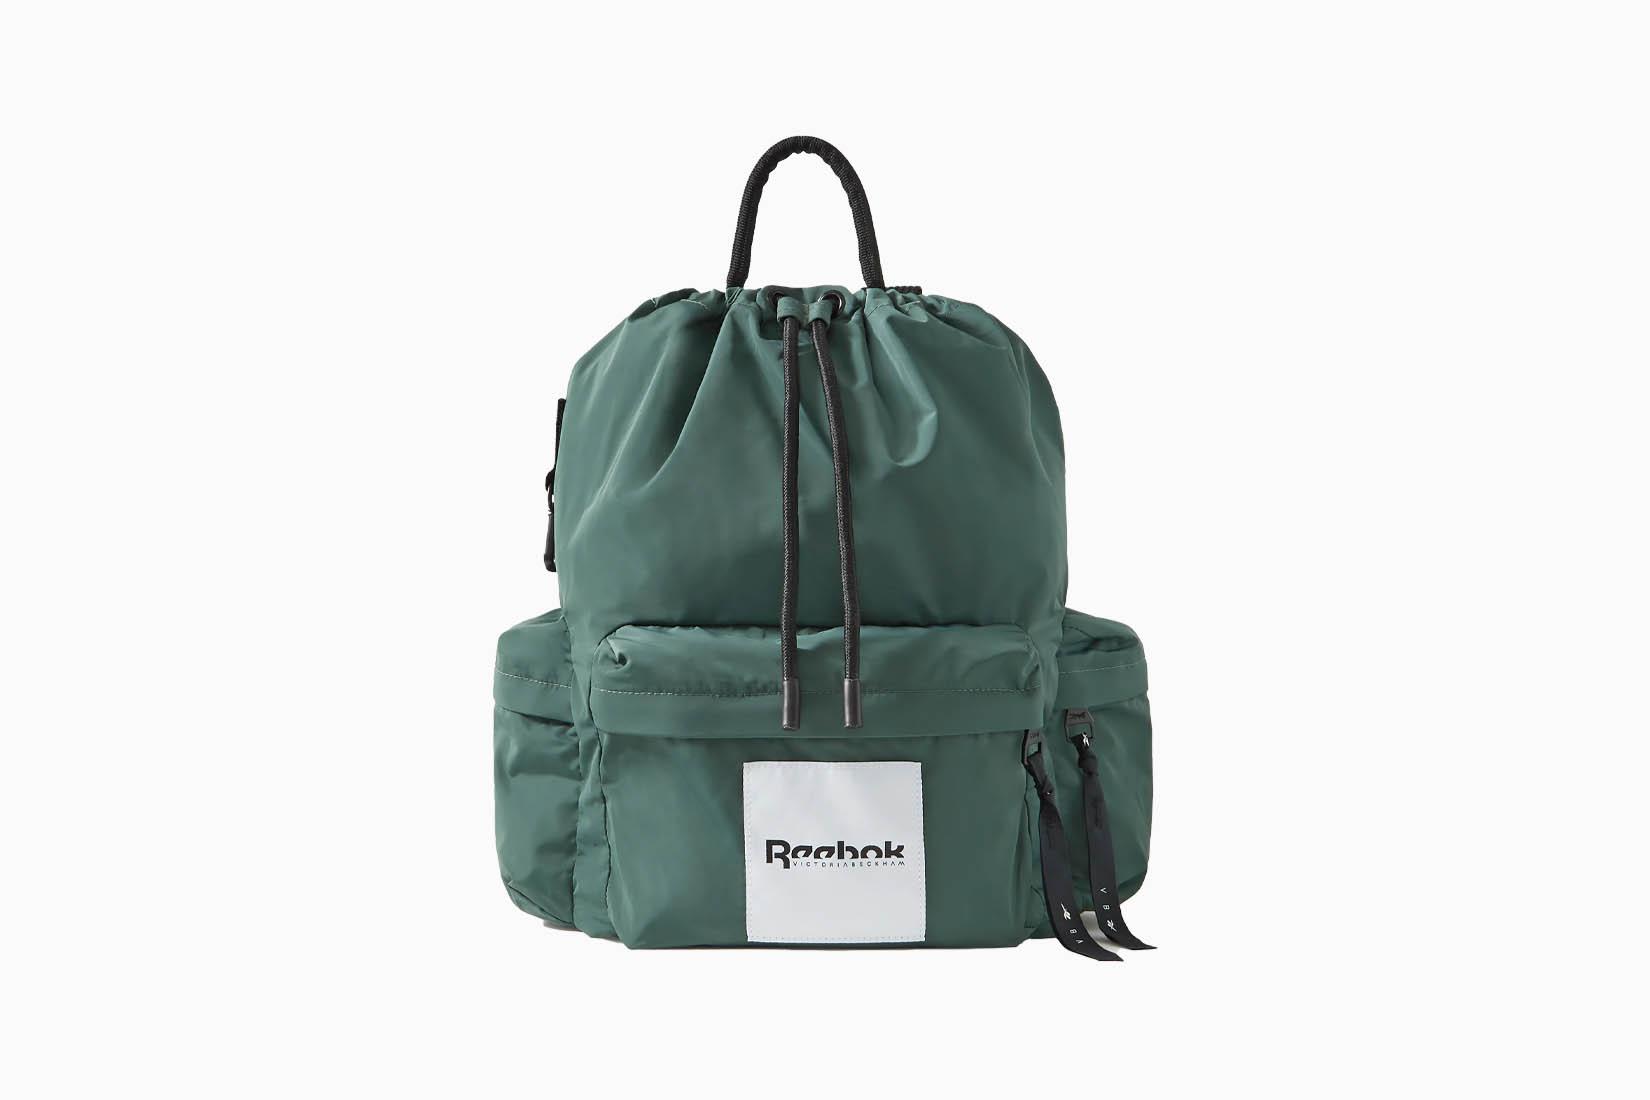 best gift kids reebok x victoria beckham backpack review Luxe Digital